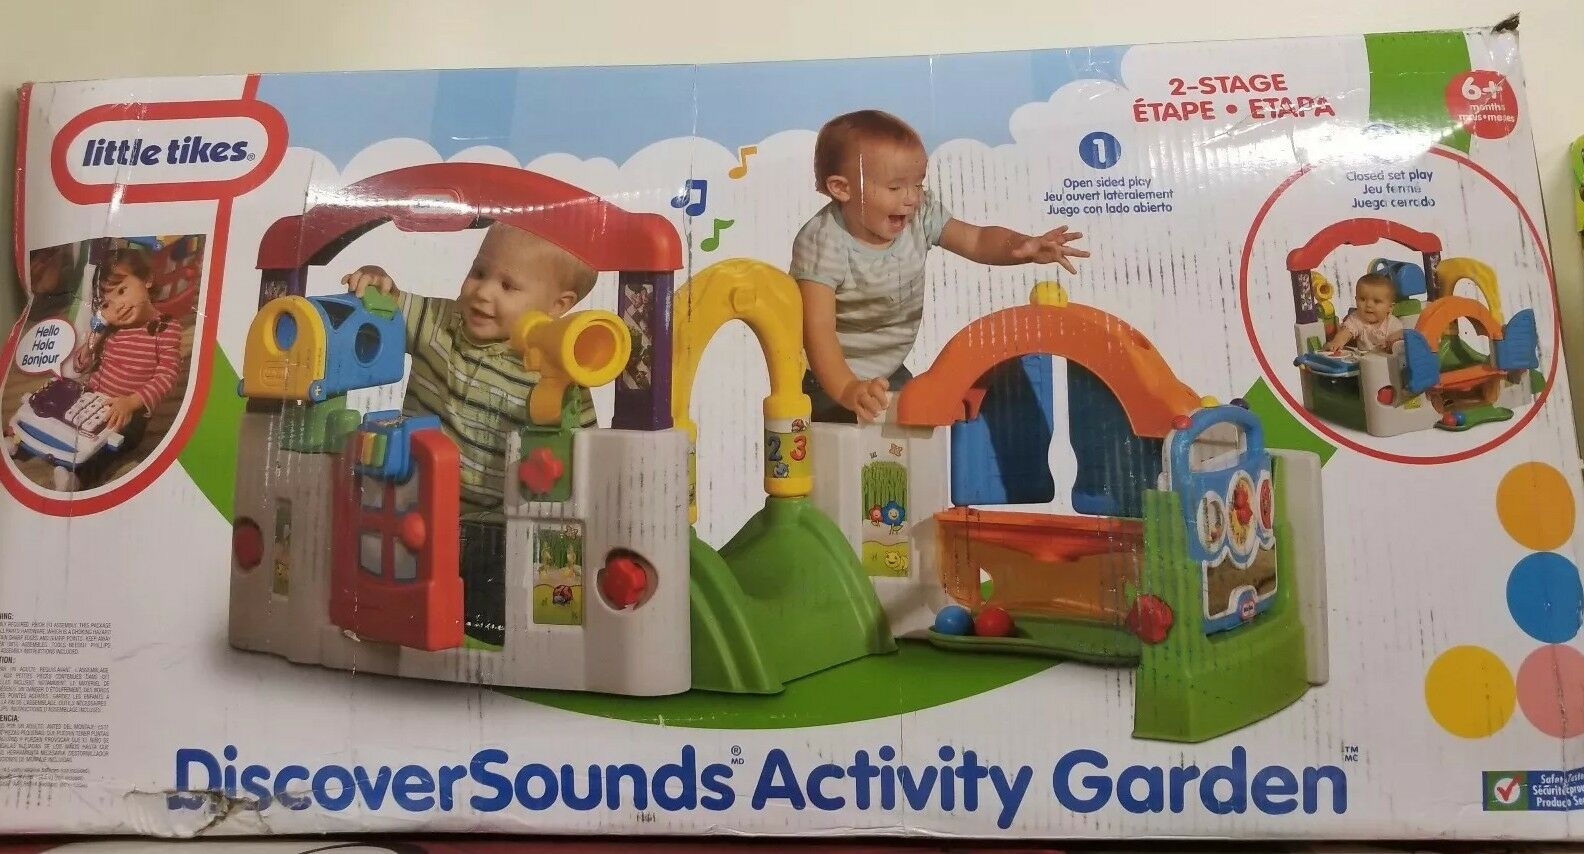 Little Tikes DiscoverSounds Activity Garden